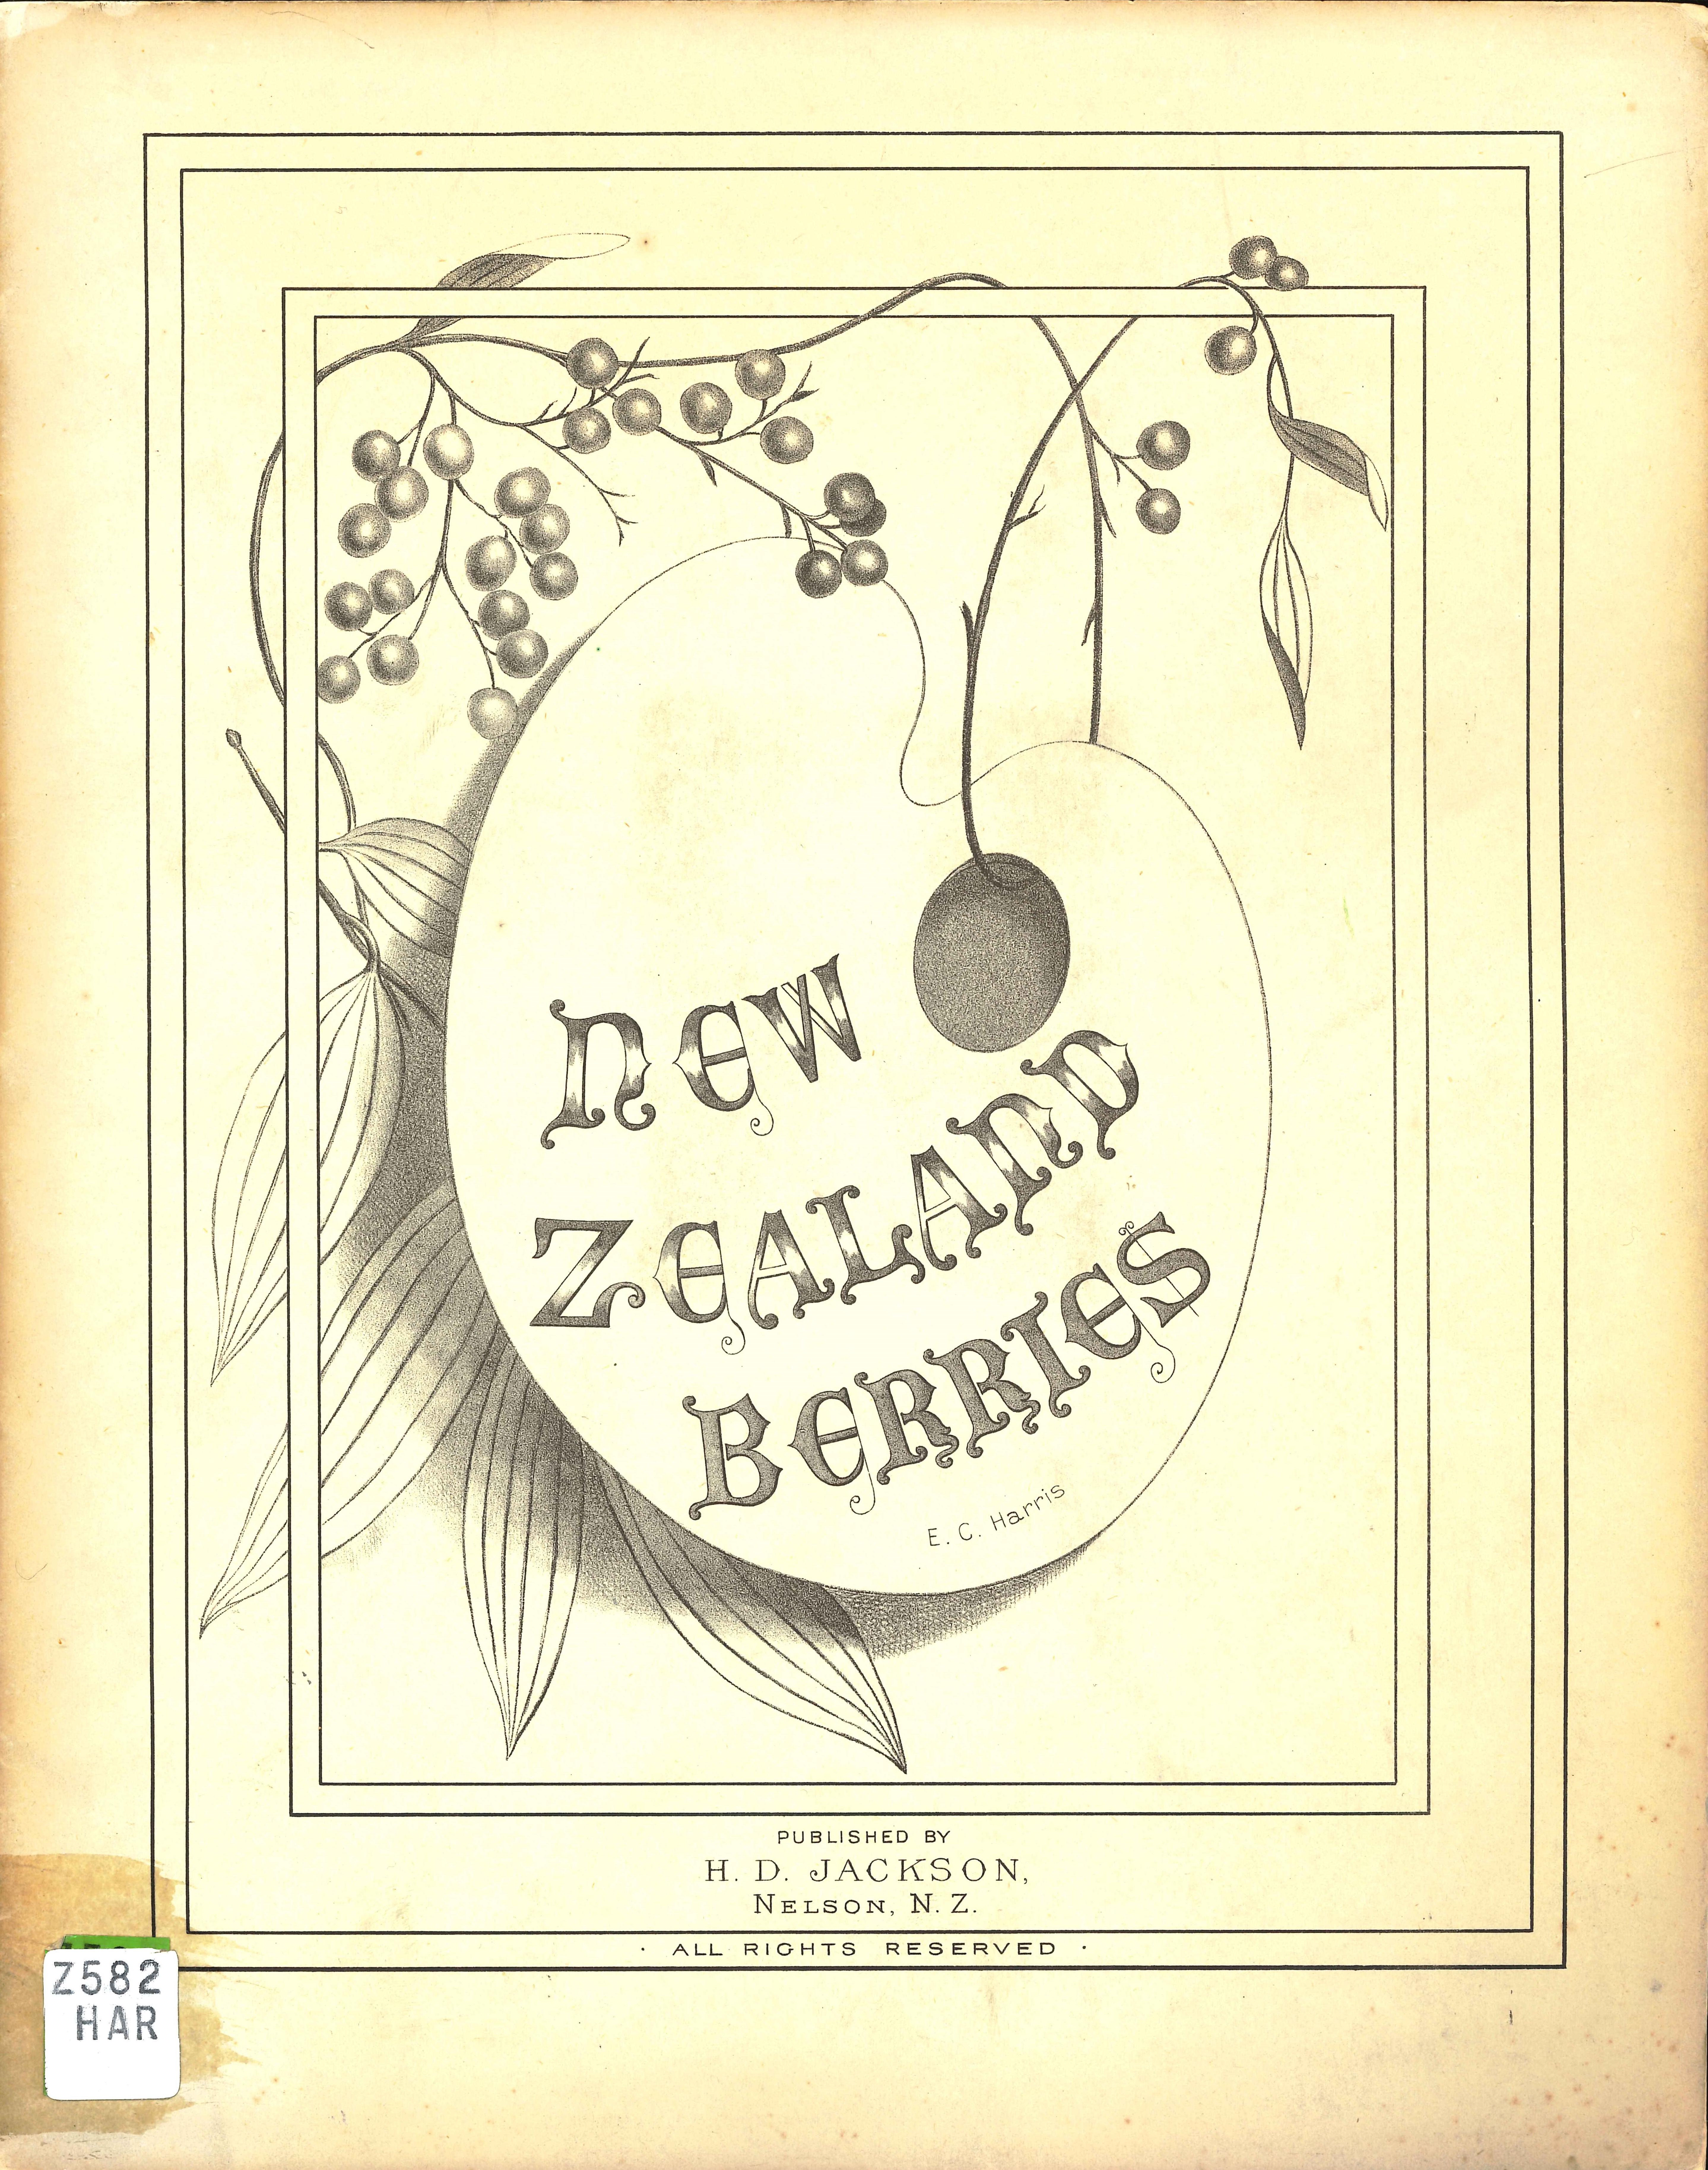 Emily Cumming Harris. New Zealand berries. Nelson: H.D. Jackson, 1890.